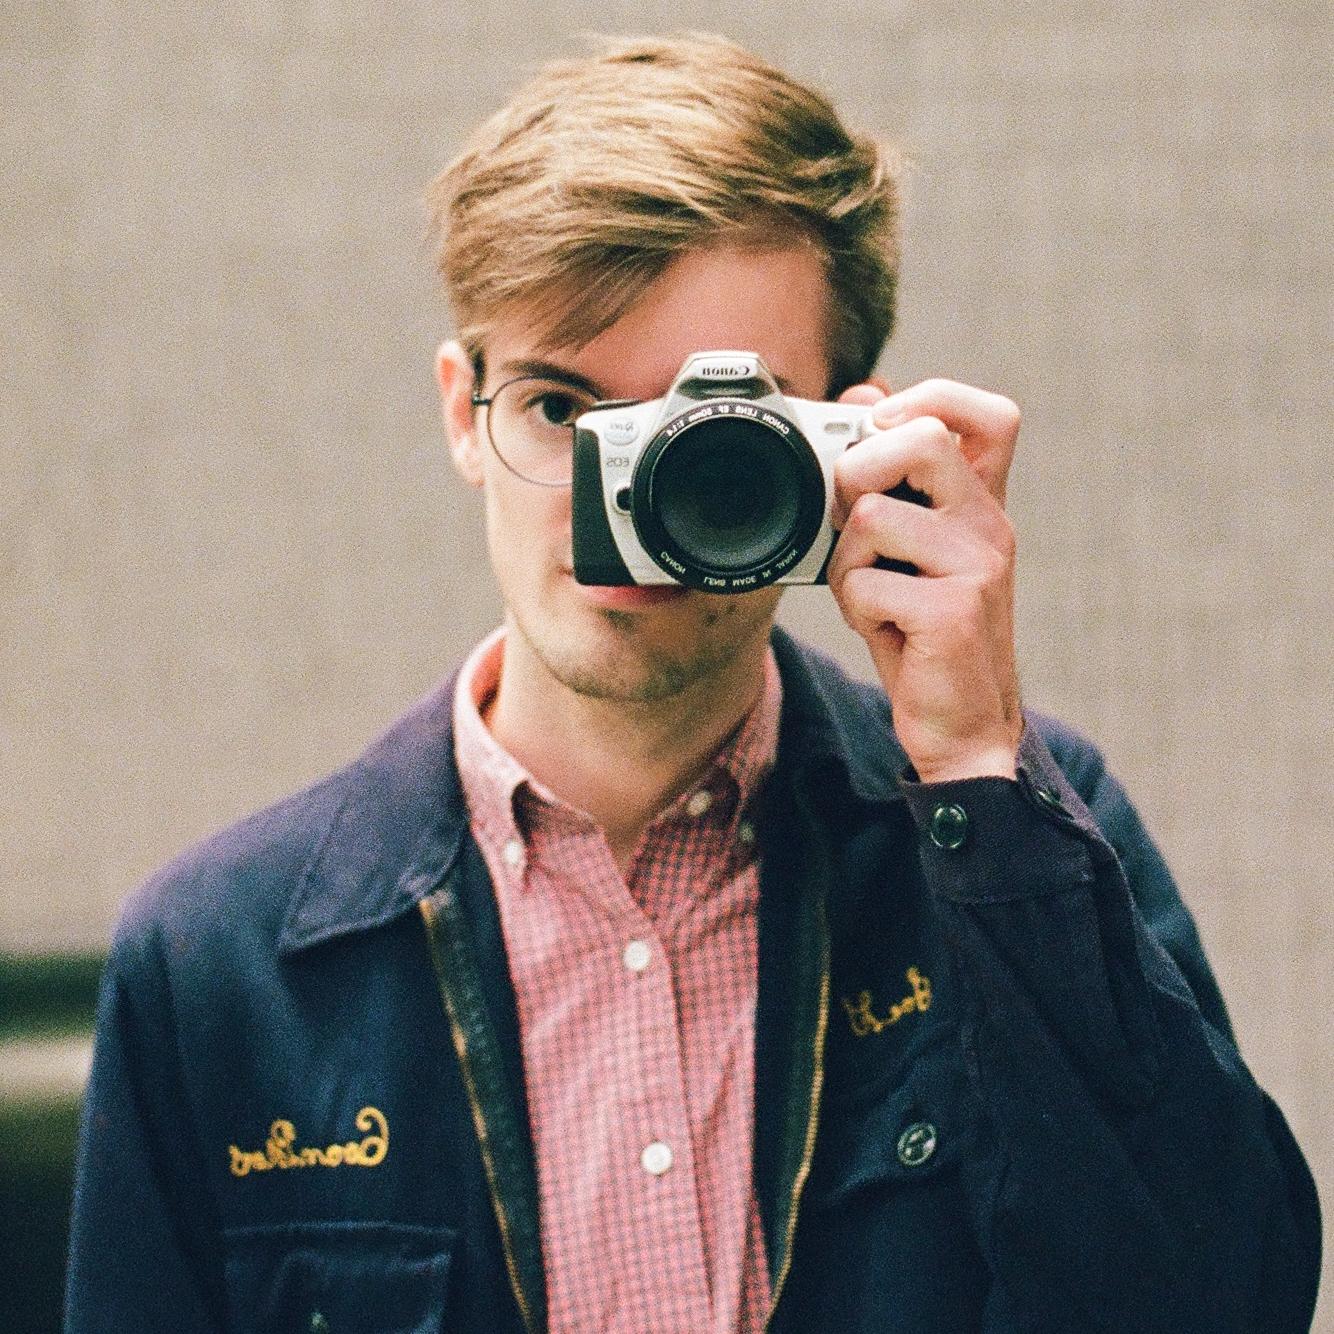 film-photo-of-nathan-wentworth-md.jpg